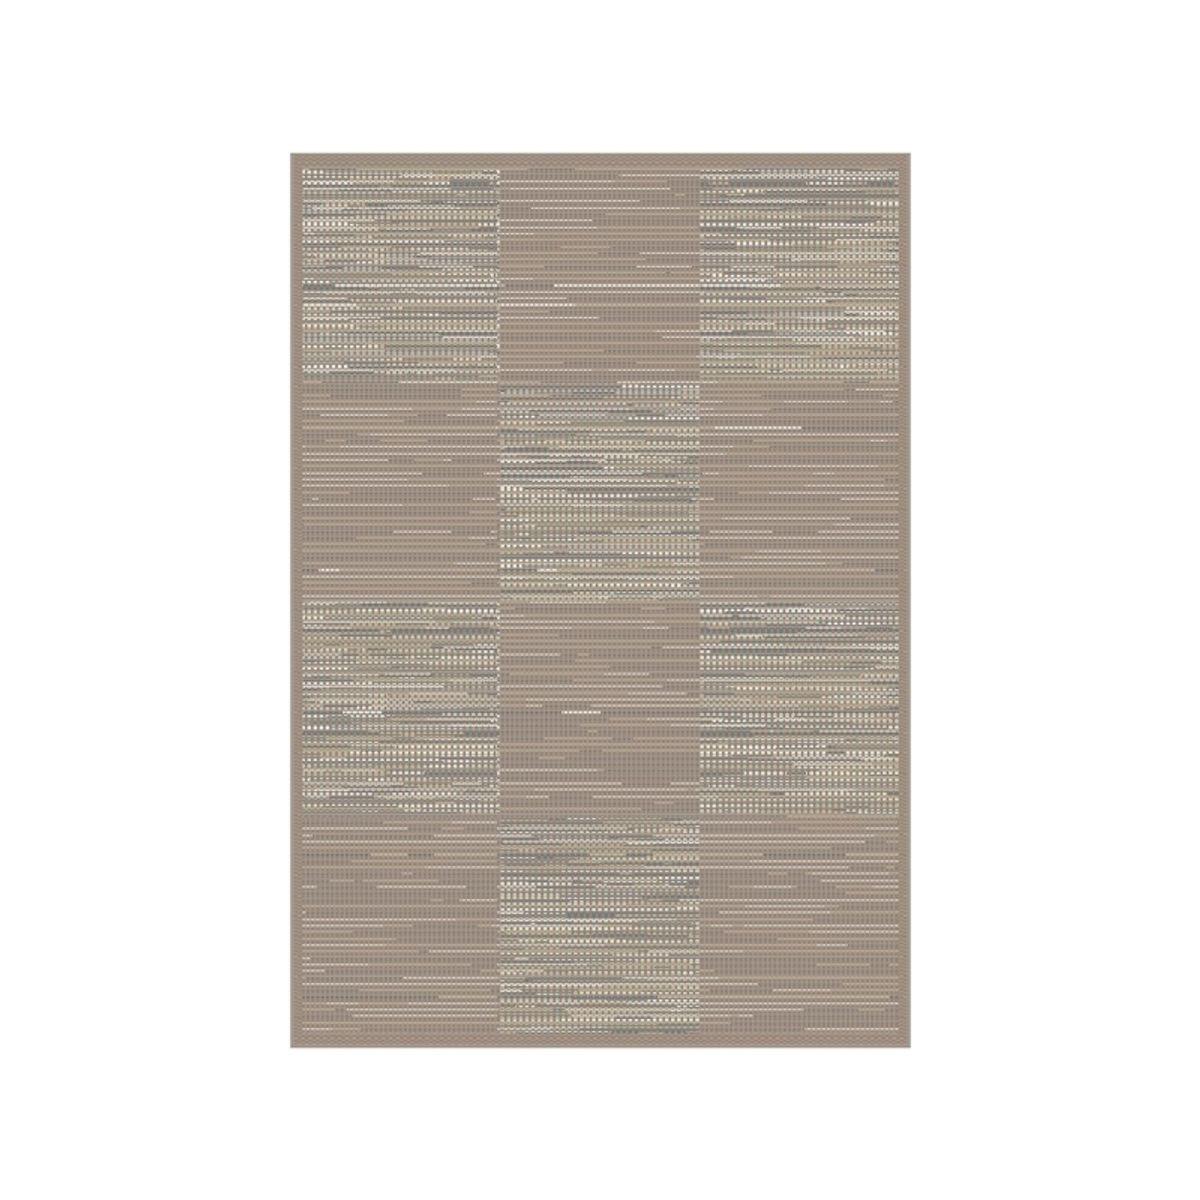 Tapis motif damier beige Mont Blanc 120x170 cm